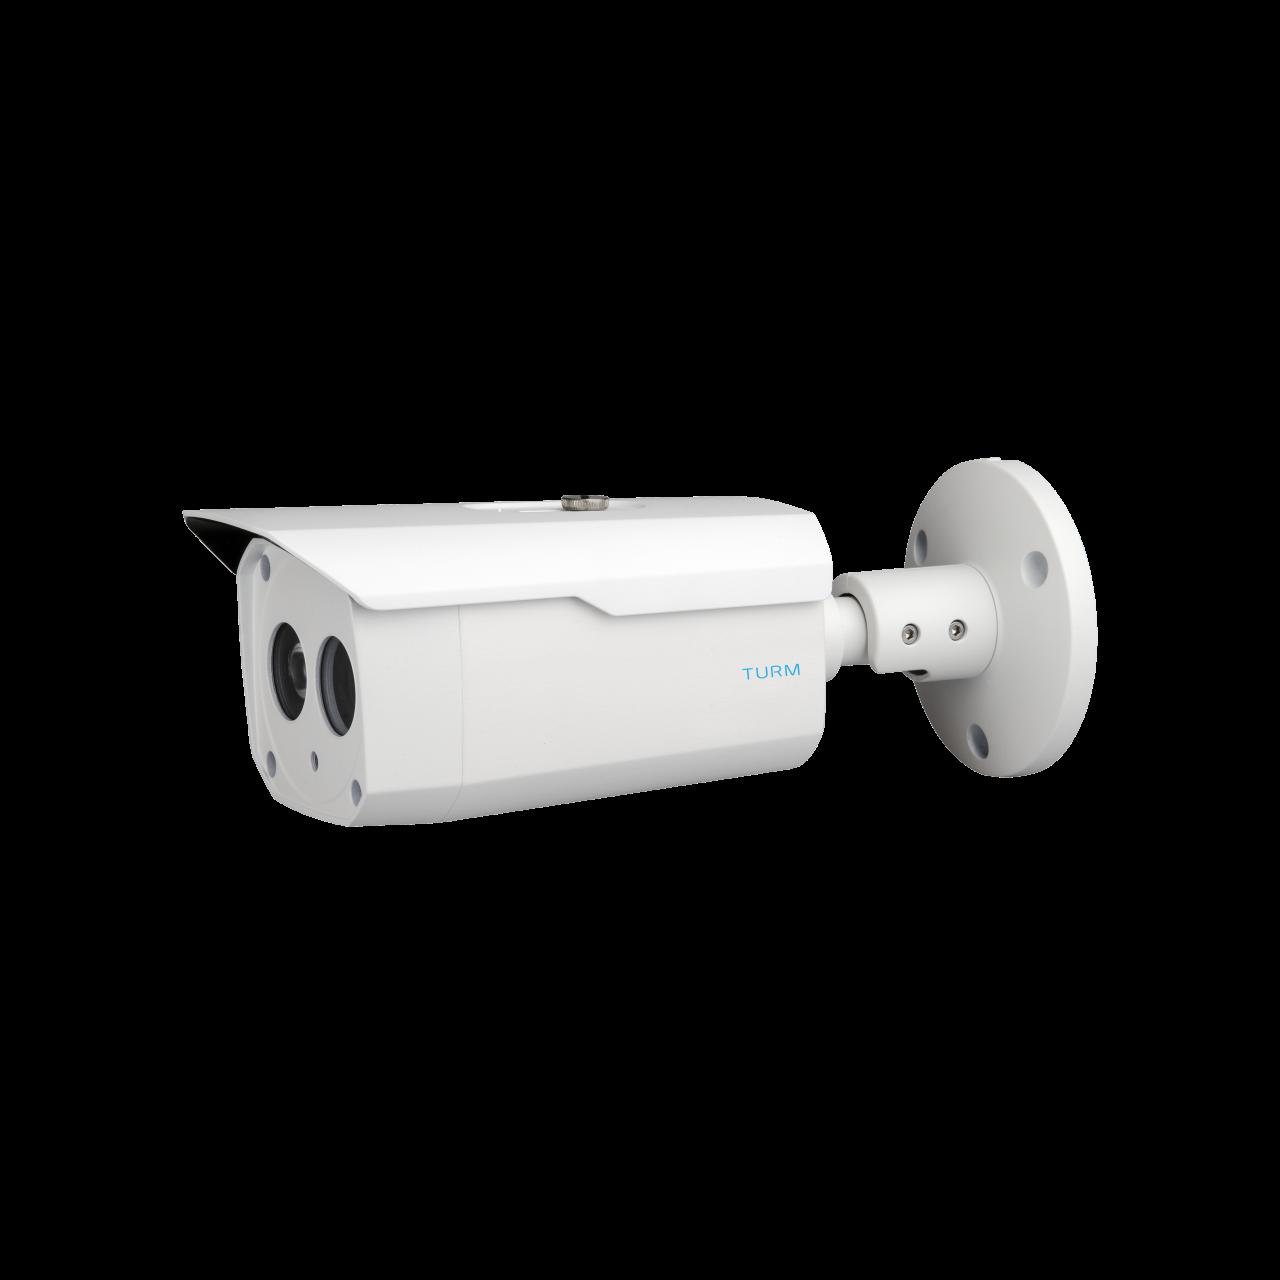 TURM HDCVI Lite 1MP Bullet Kamera, 50m Nachtsicht, 2,8mm Weitwinkel Objektiv, IP67